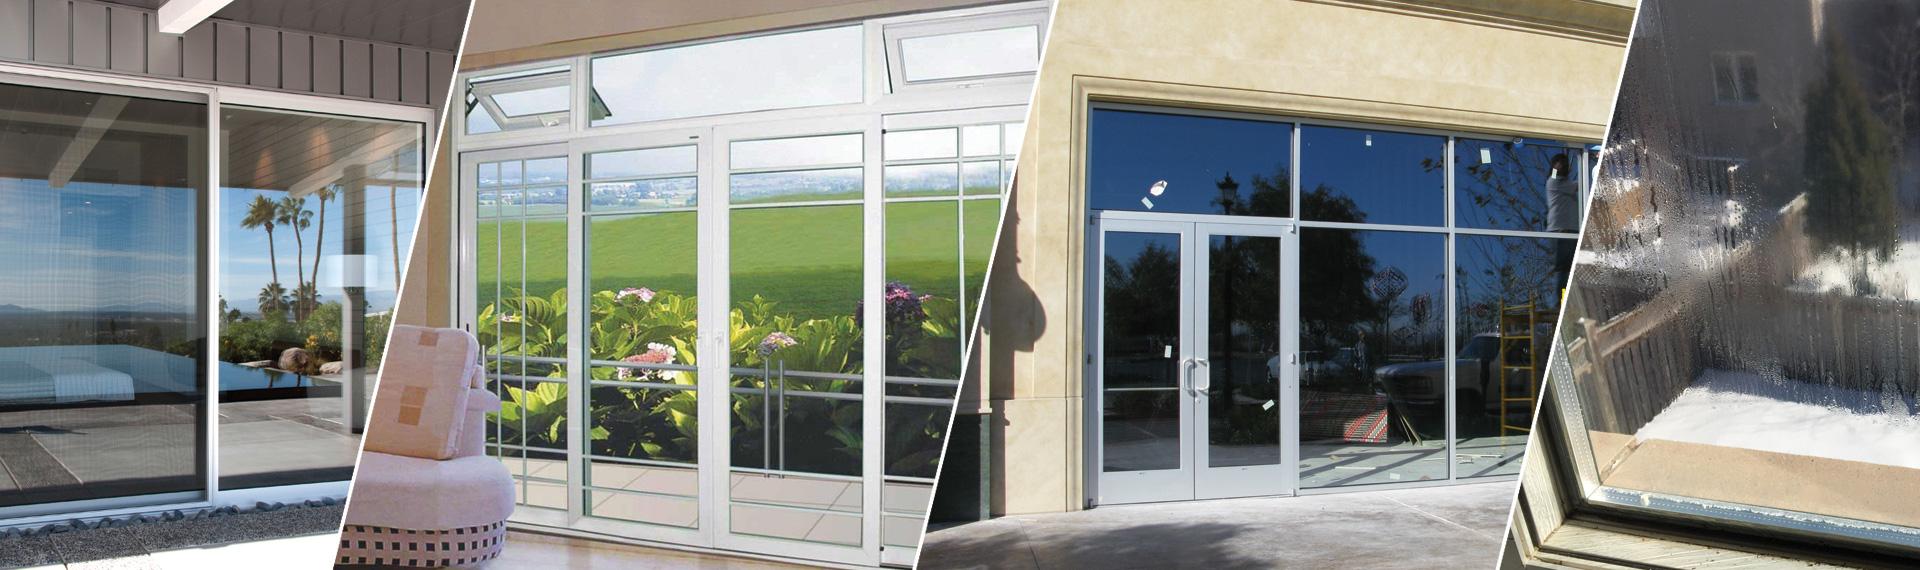 Sliver Spring Glass Repair